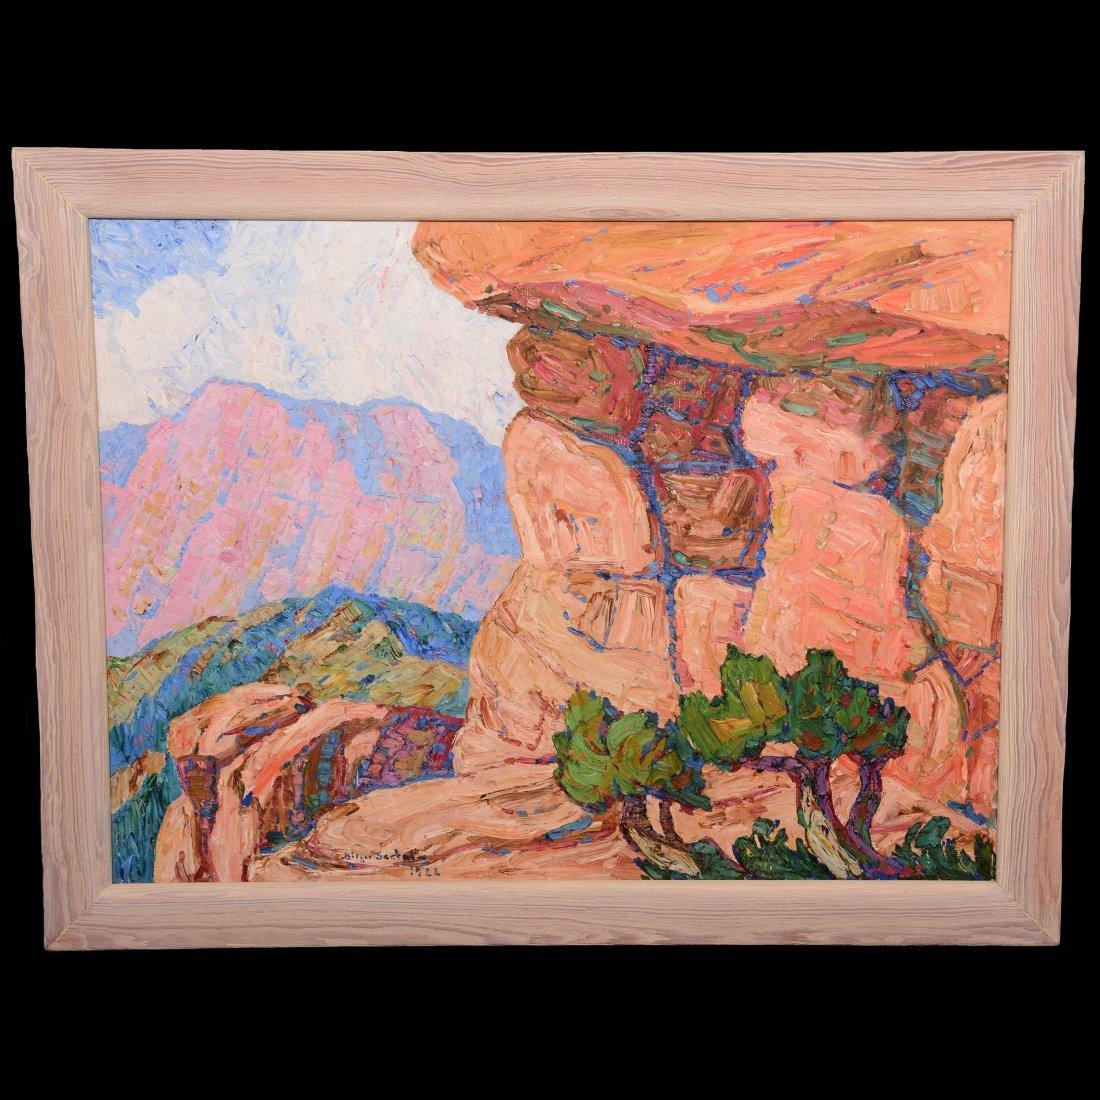 Original Birger Sandzen Oil Painting on Canvas - 9